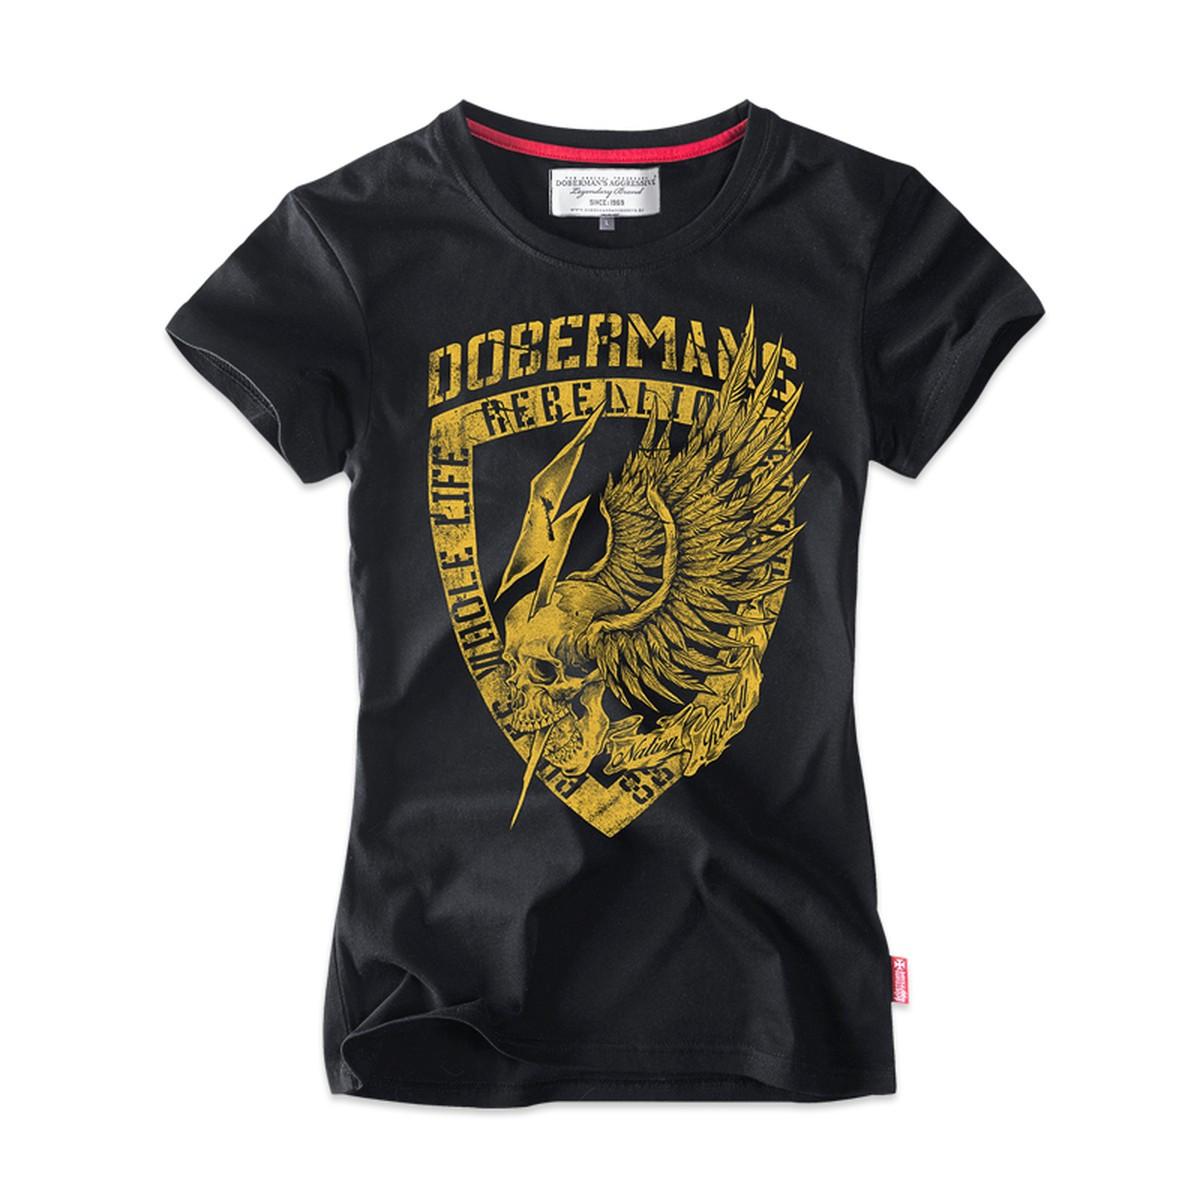 Футболка женская Dobermans Aggressive TSD164BK XL Черный (TSD164BK-XL)